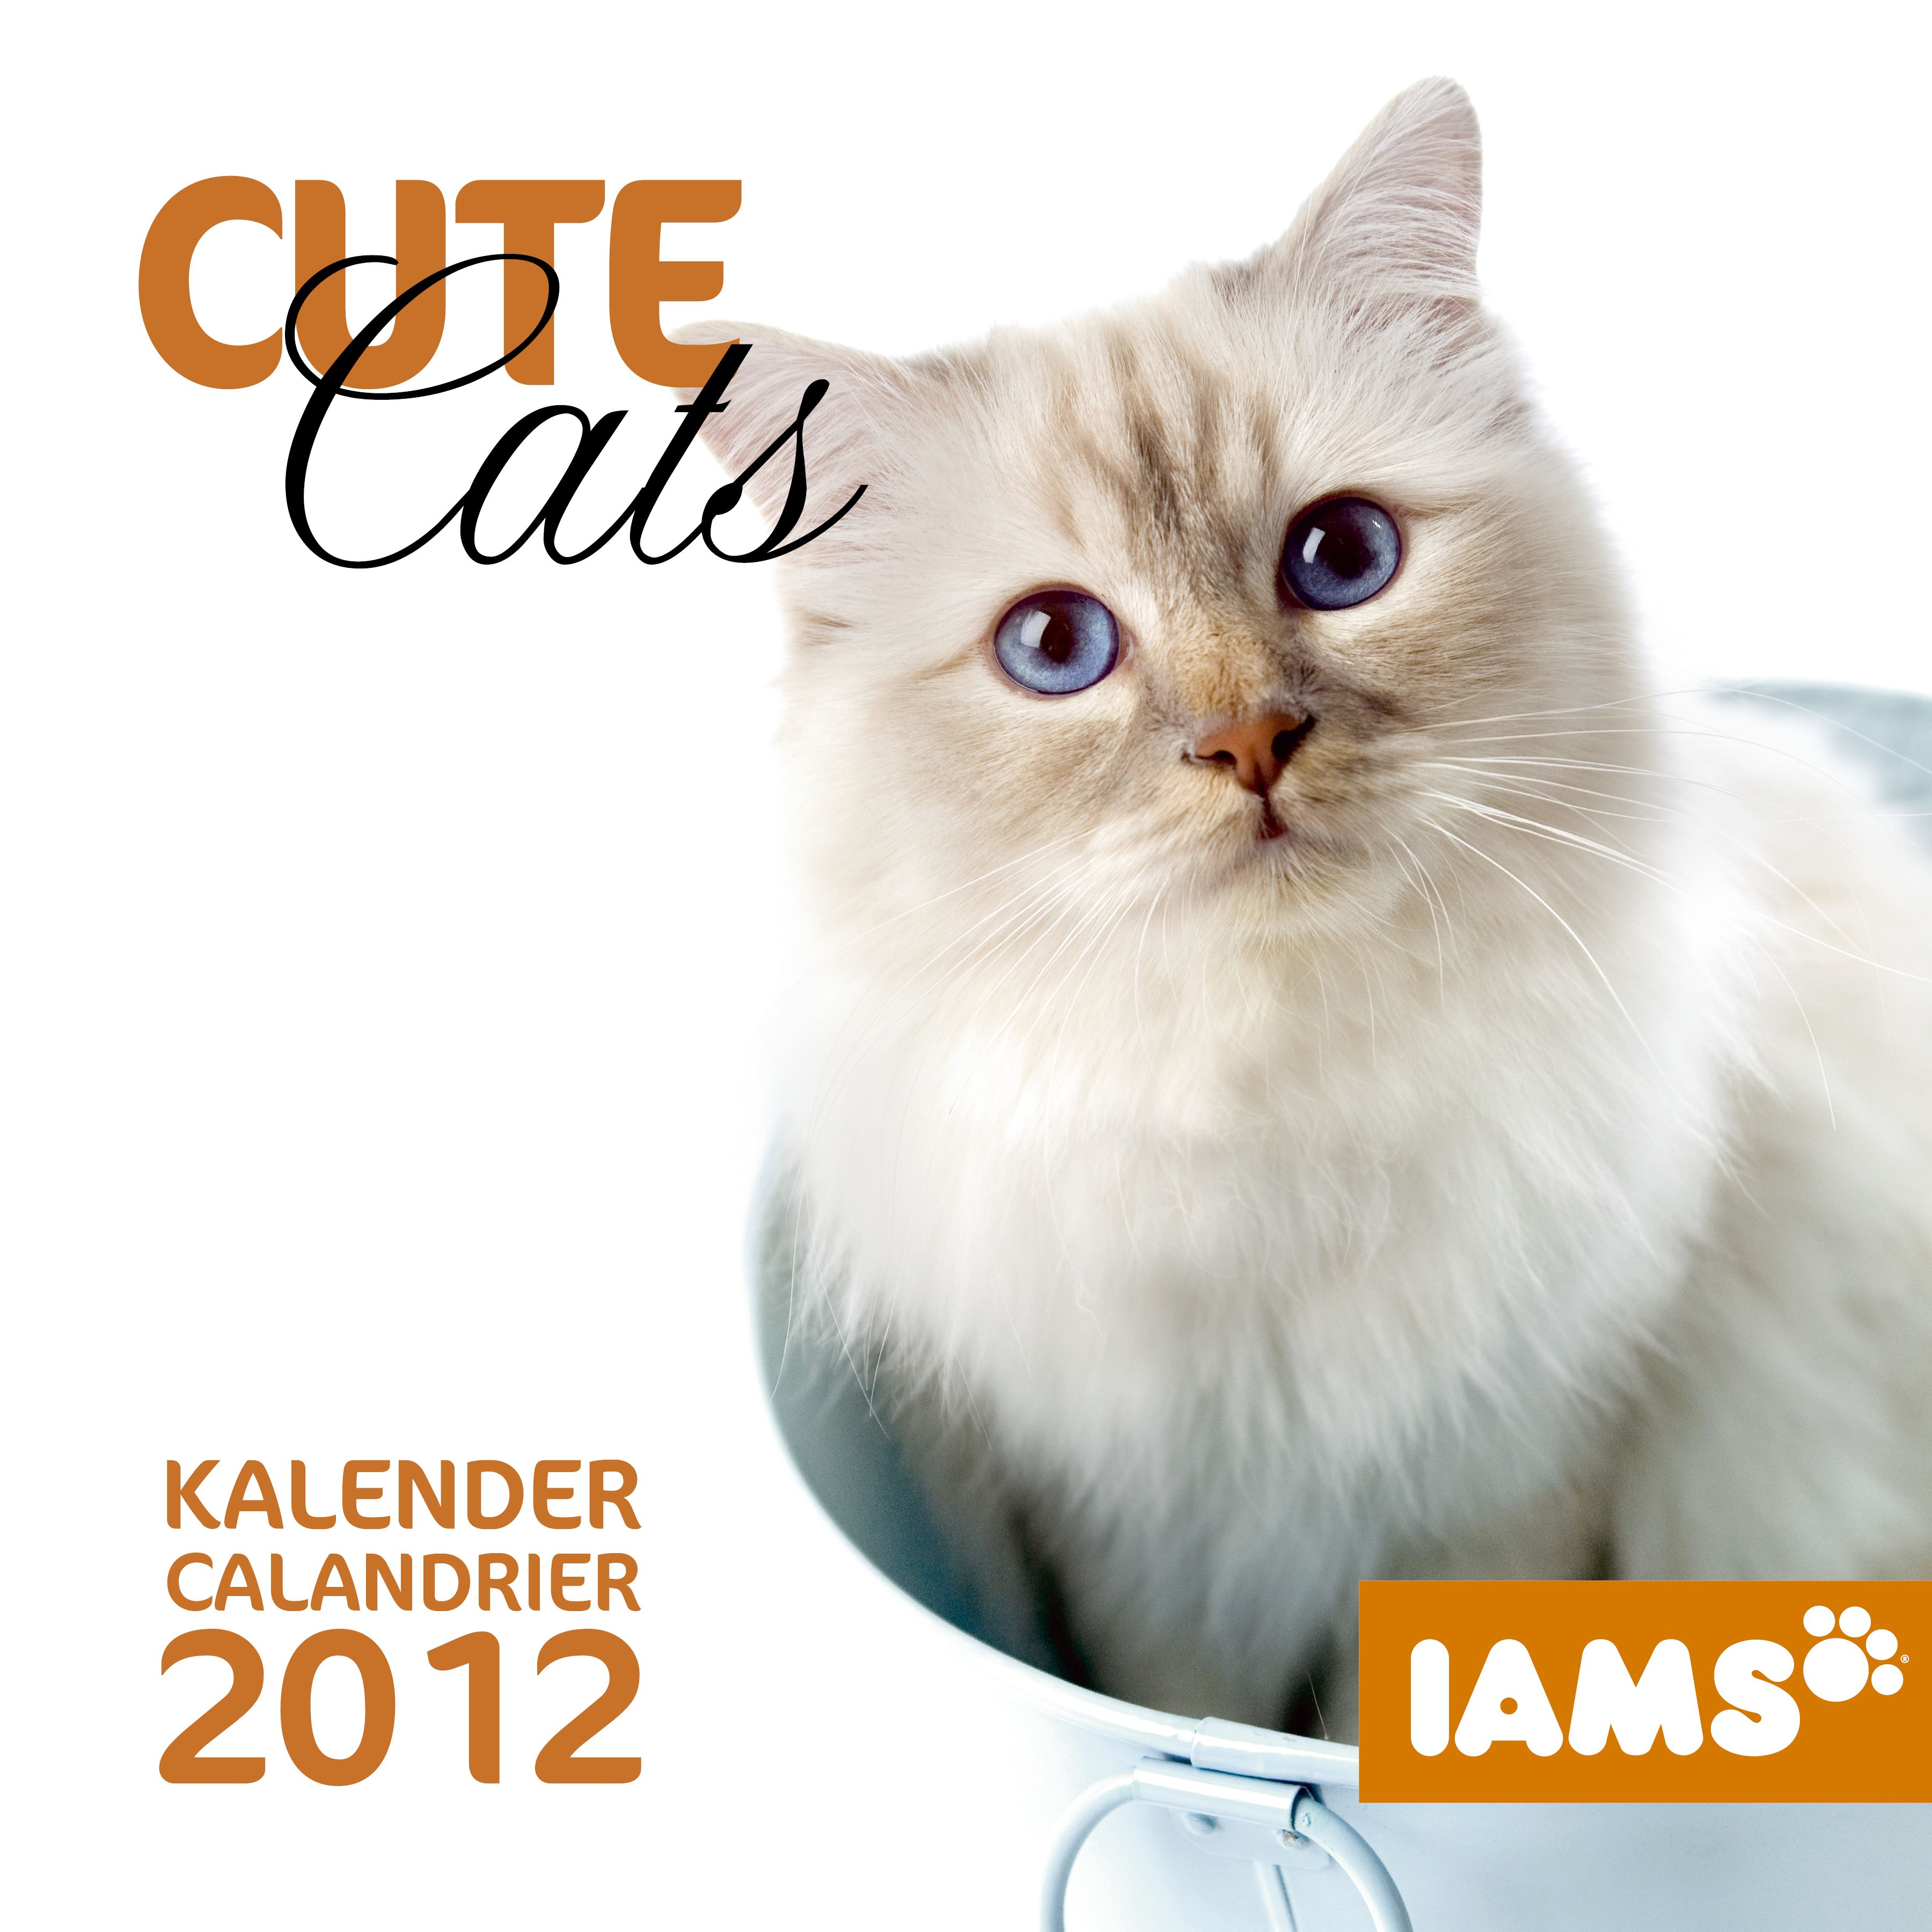 Cat food iams calendar